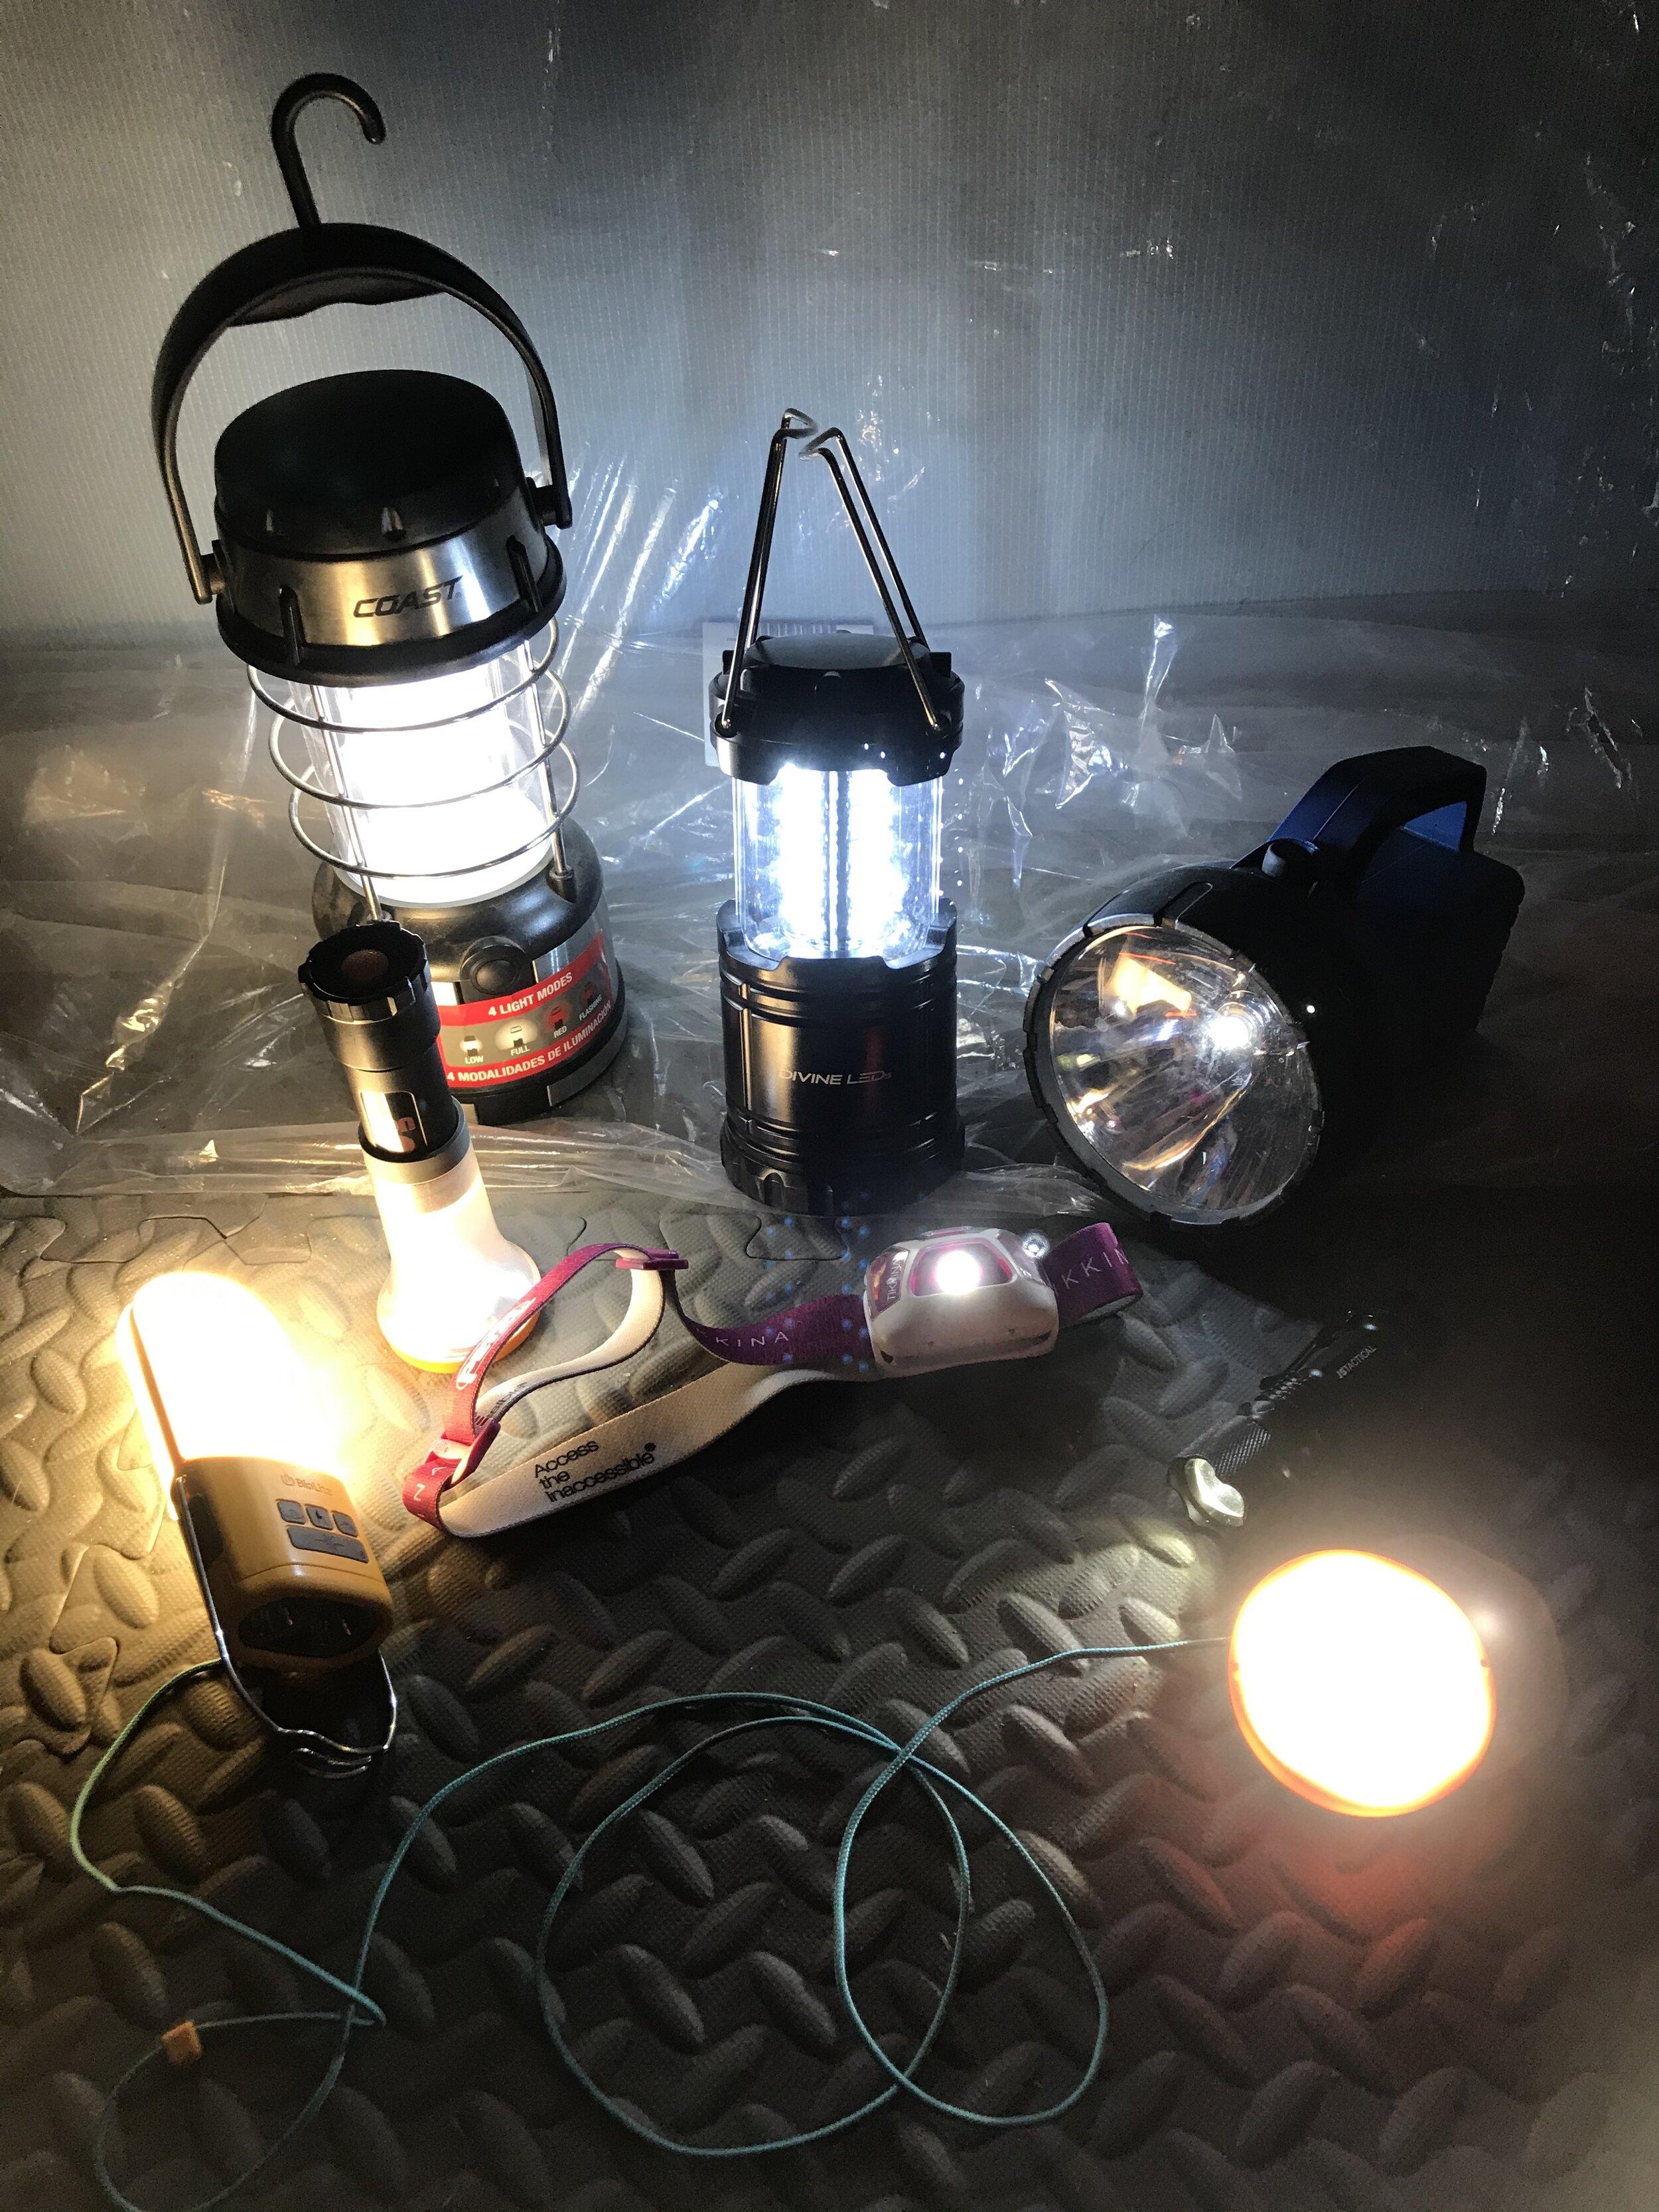 A few of my many, many flashlights, lanterns, and headlamps